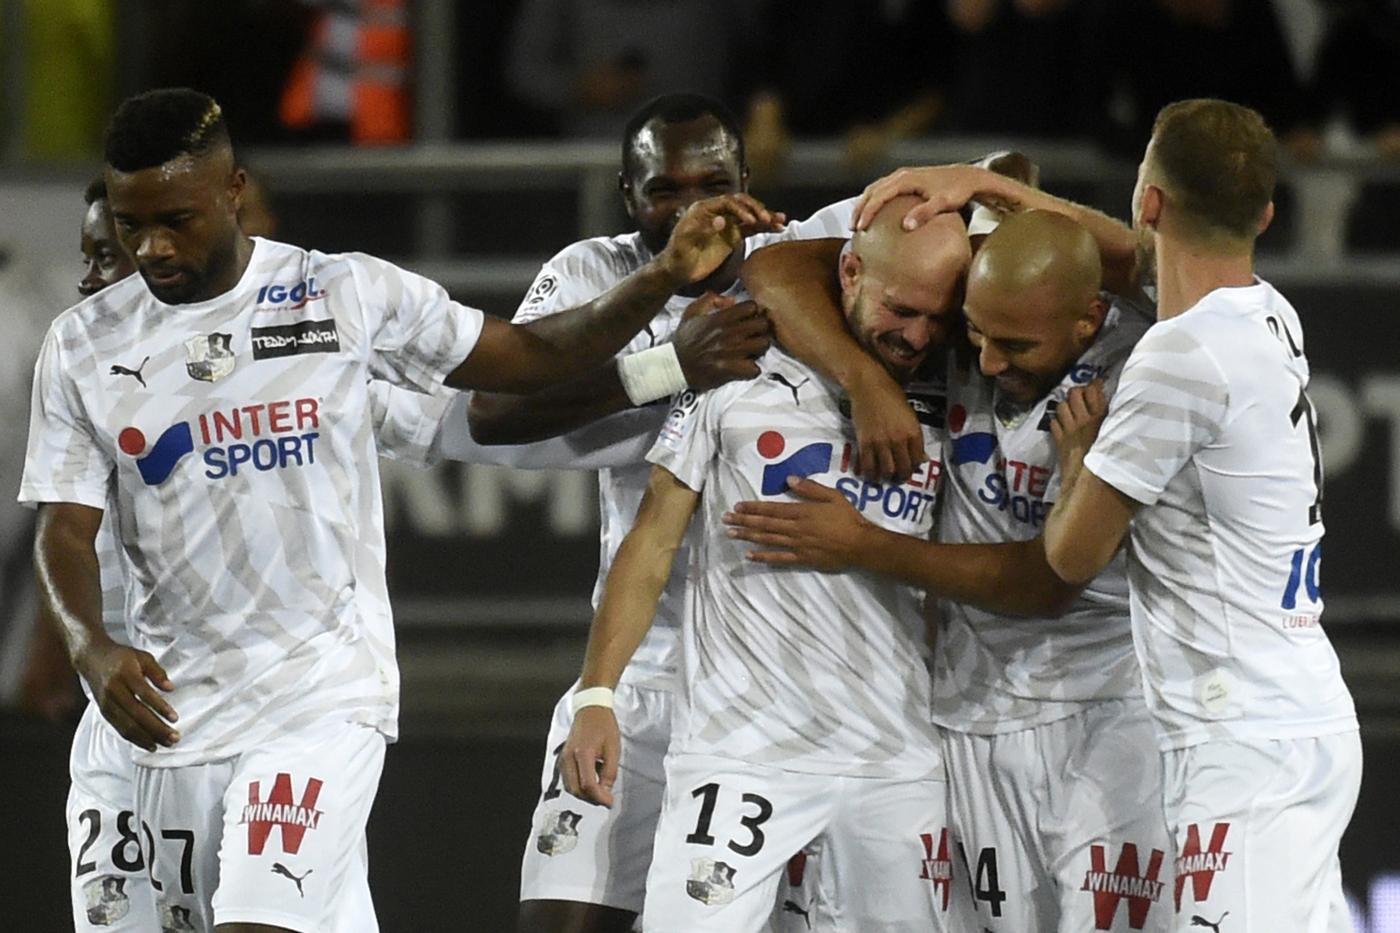 Pronostico Amiens-Reims 15 gennaio: le quote di Ligue 1